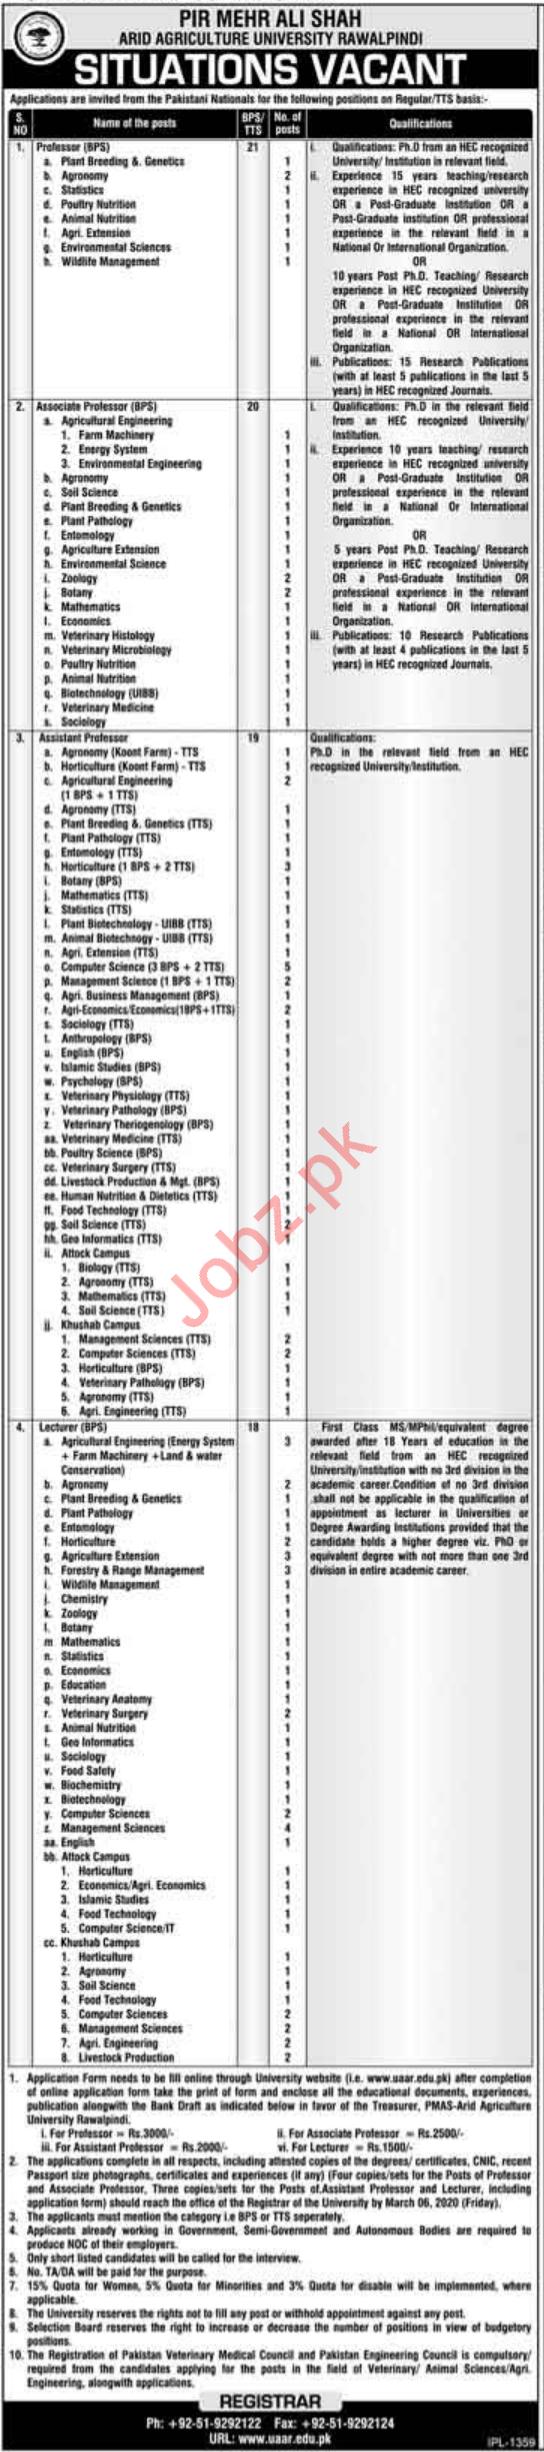 Pir Mehr Ali Shah Arid Agriculture University Jobs 2020